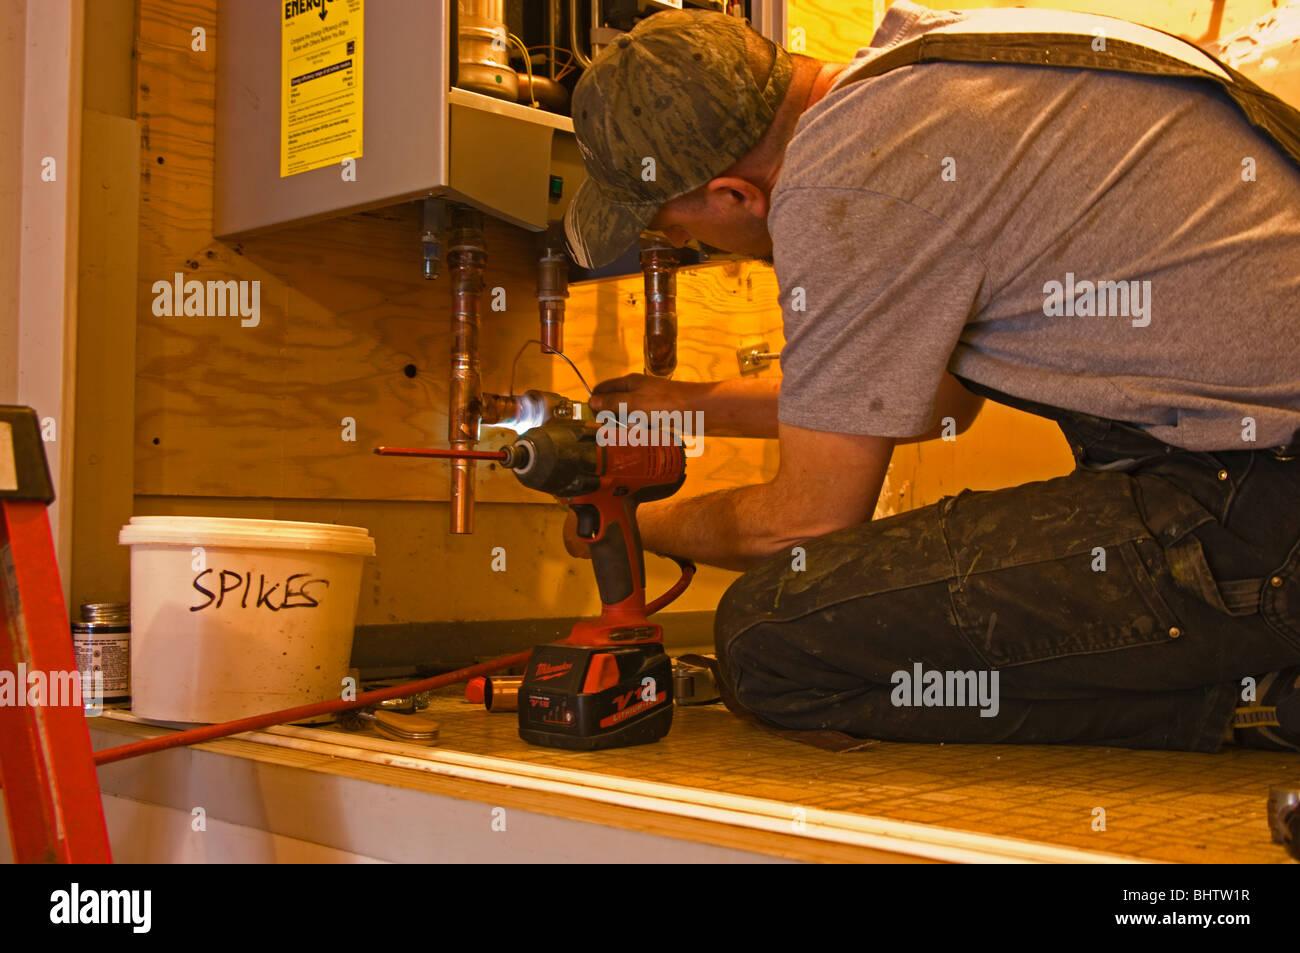 plumber stockfotos plumber bilder alamy. Black Bedroom Furniture Sets. Home Design Ideas